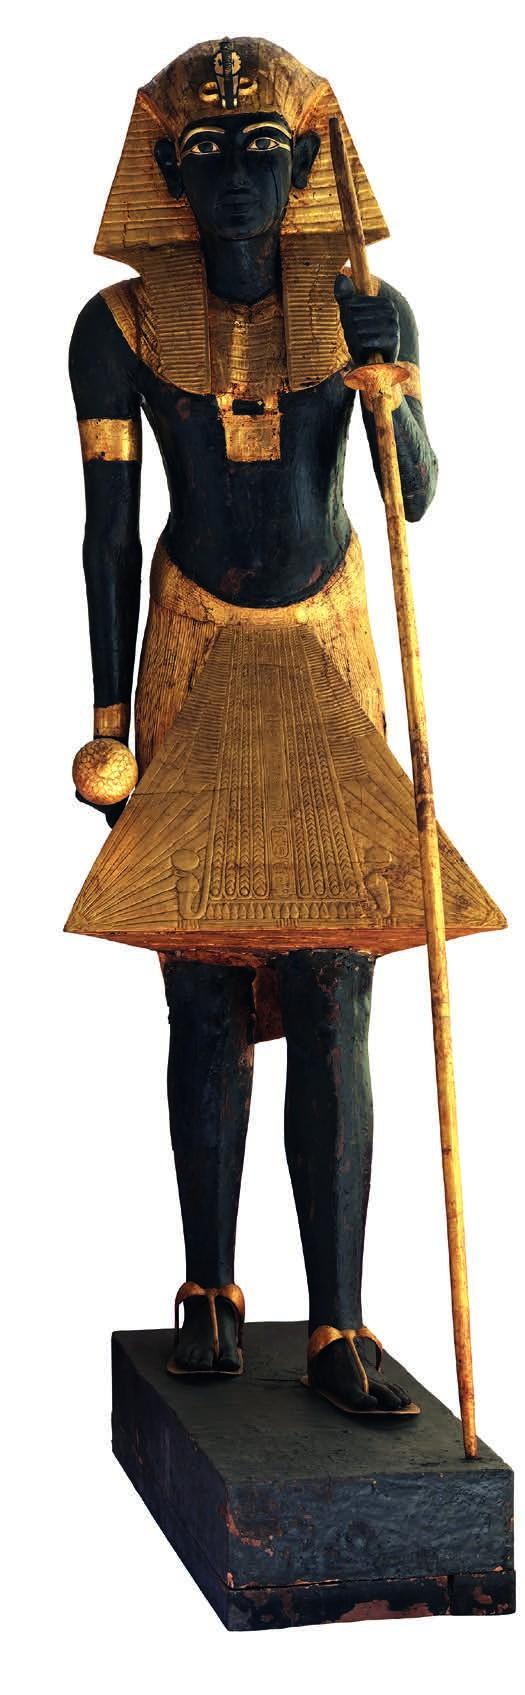 Statue à l'effigie du roi montant la garde, XVIIIe dynastie, règne de Toutânkhamon, 1336-1326 av. J.-C.